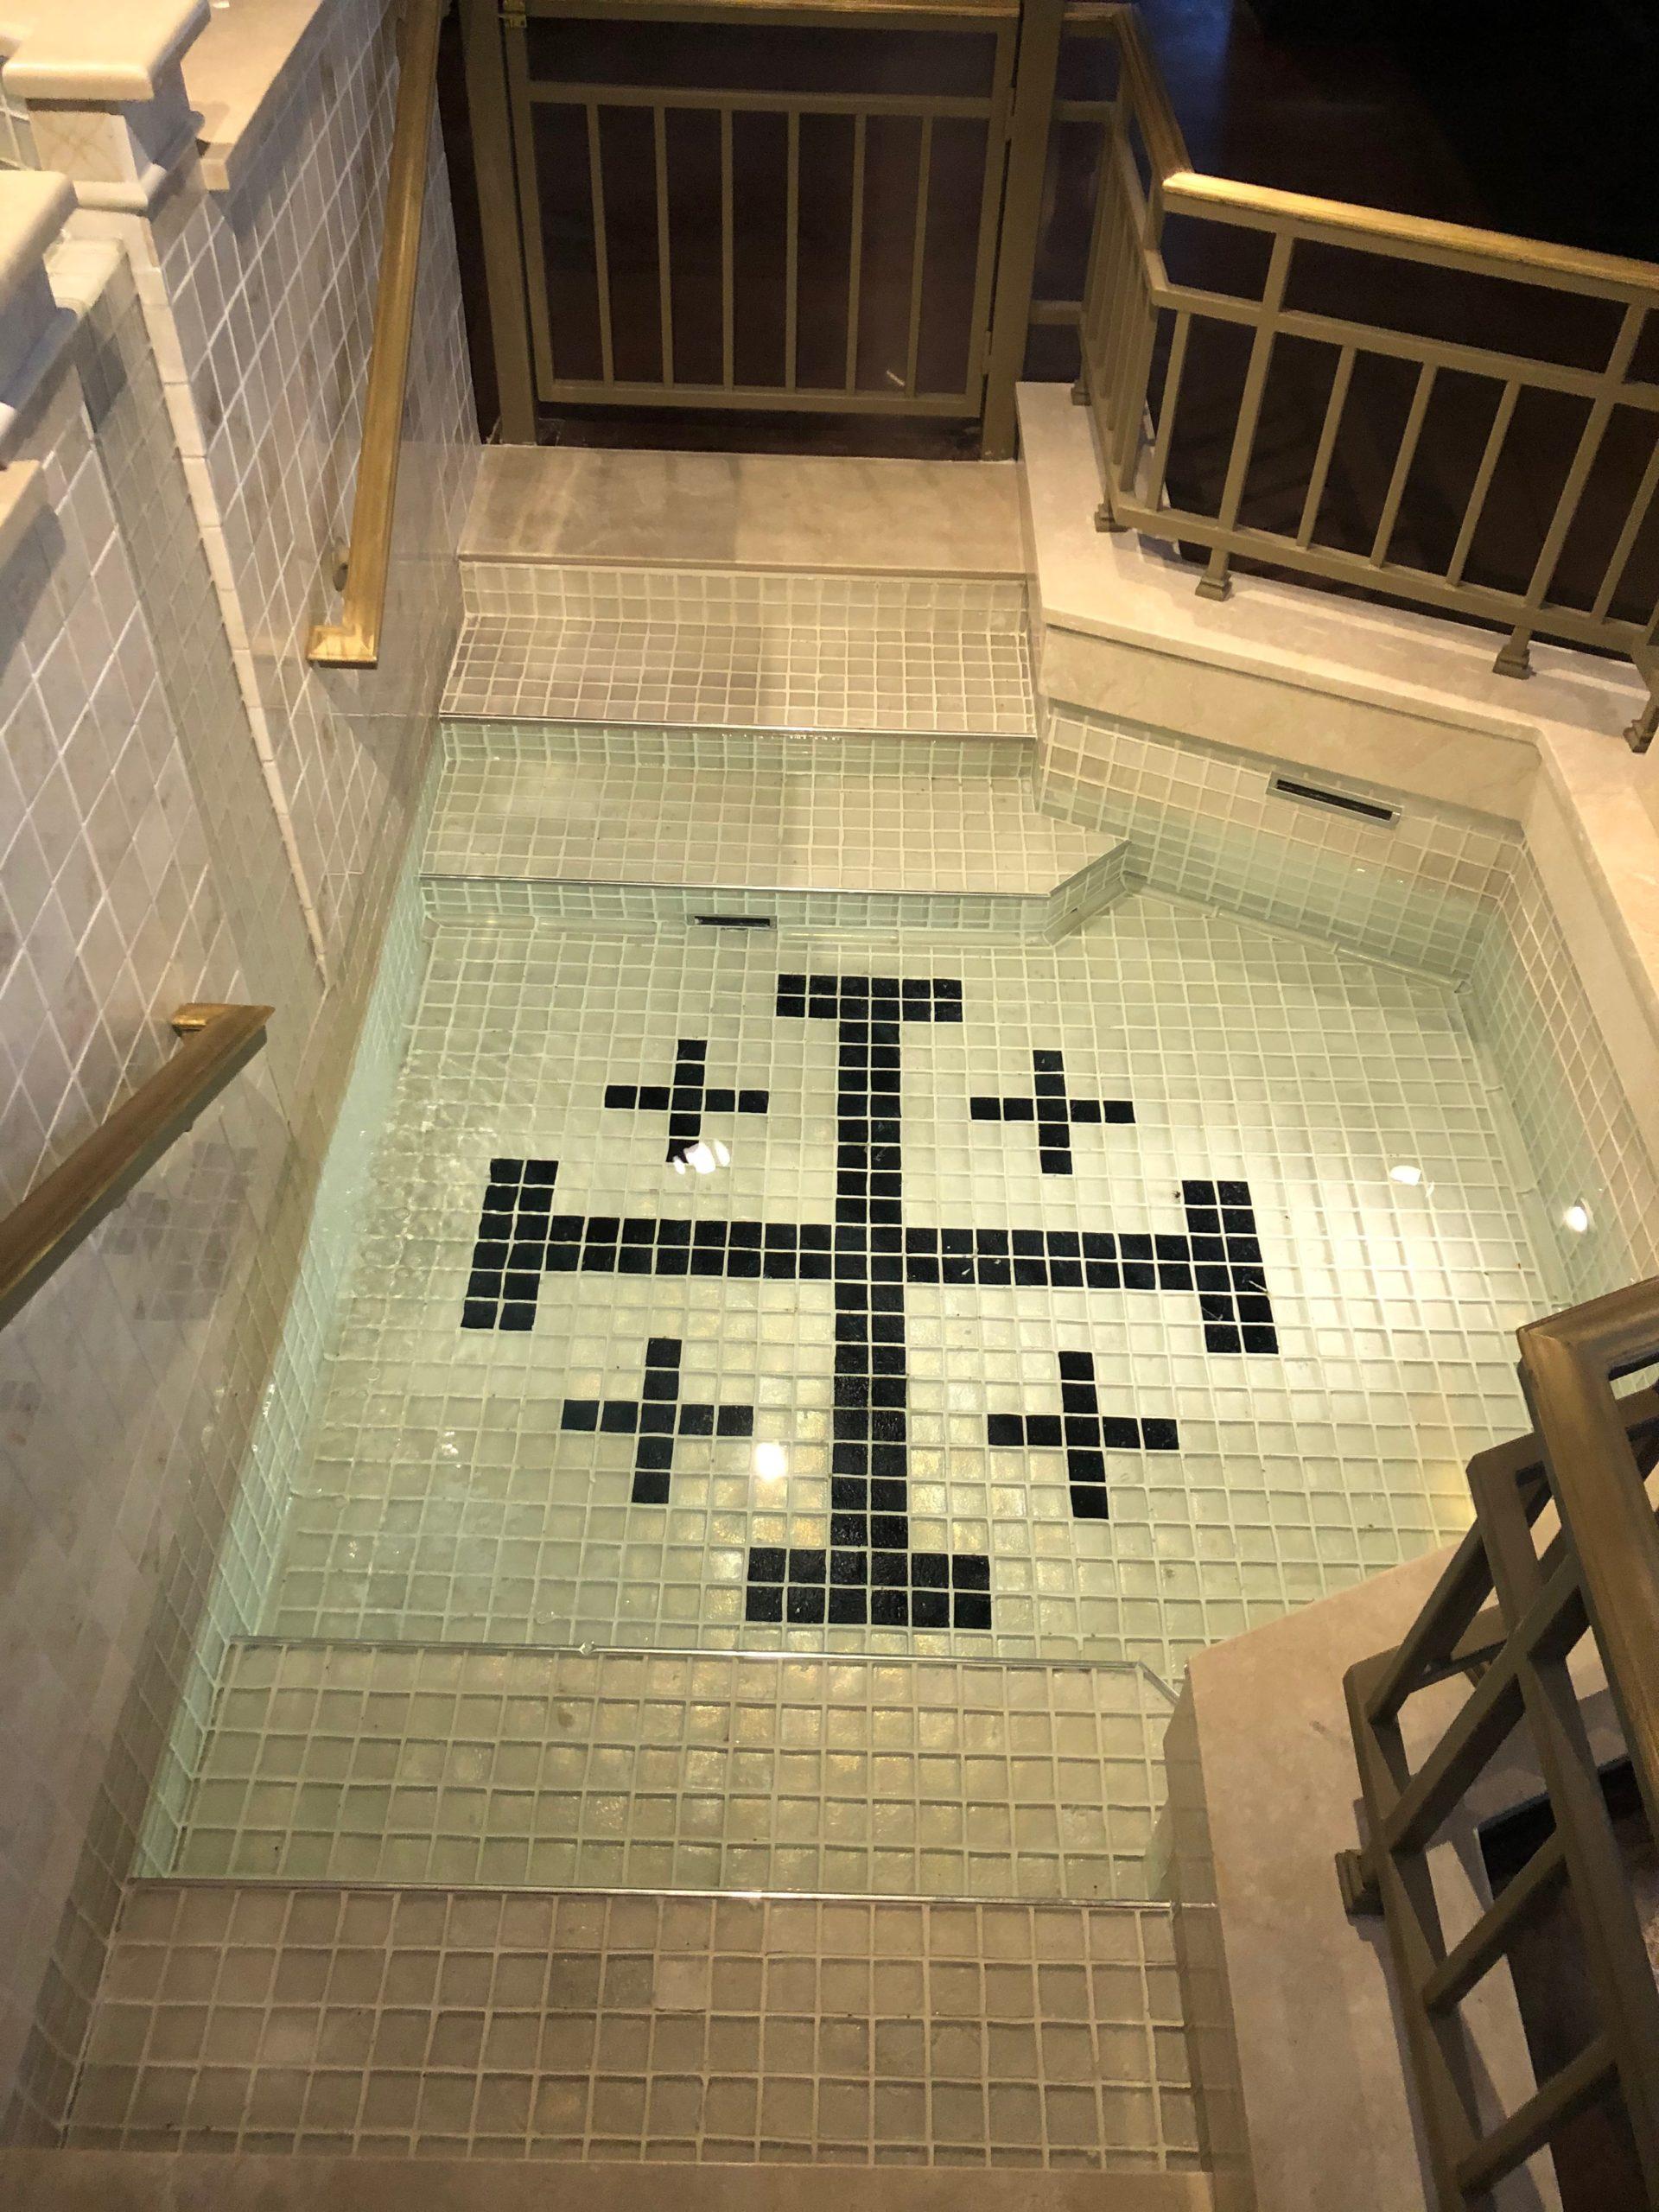 Immersion Baptismal Font with Built-in Descending and Ascending Steps, Floor Design Detail, Holy Spirit Church, Mustang, OK.